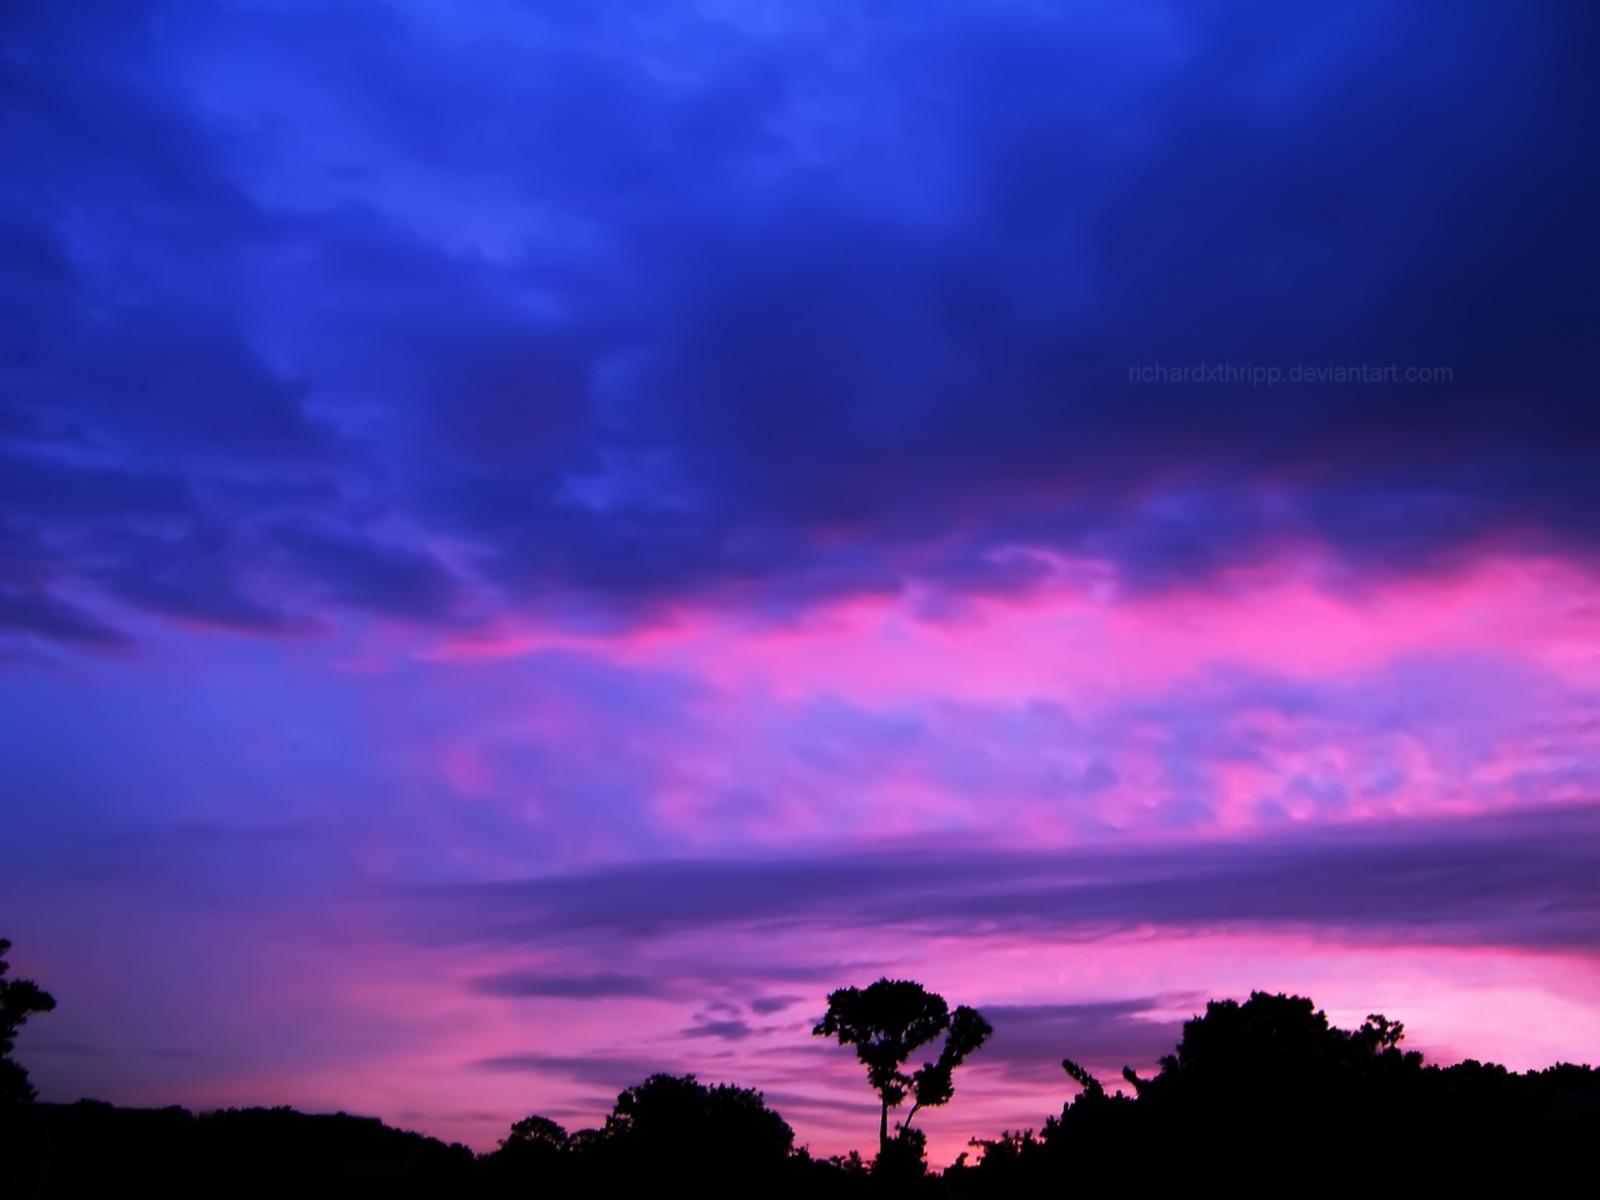 Pink and Purple Sunset 3 WP by richardxthripp 1600x1200